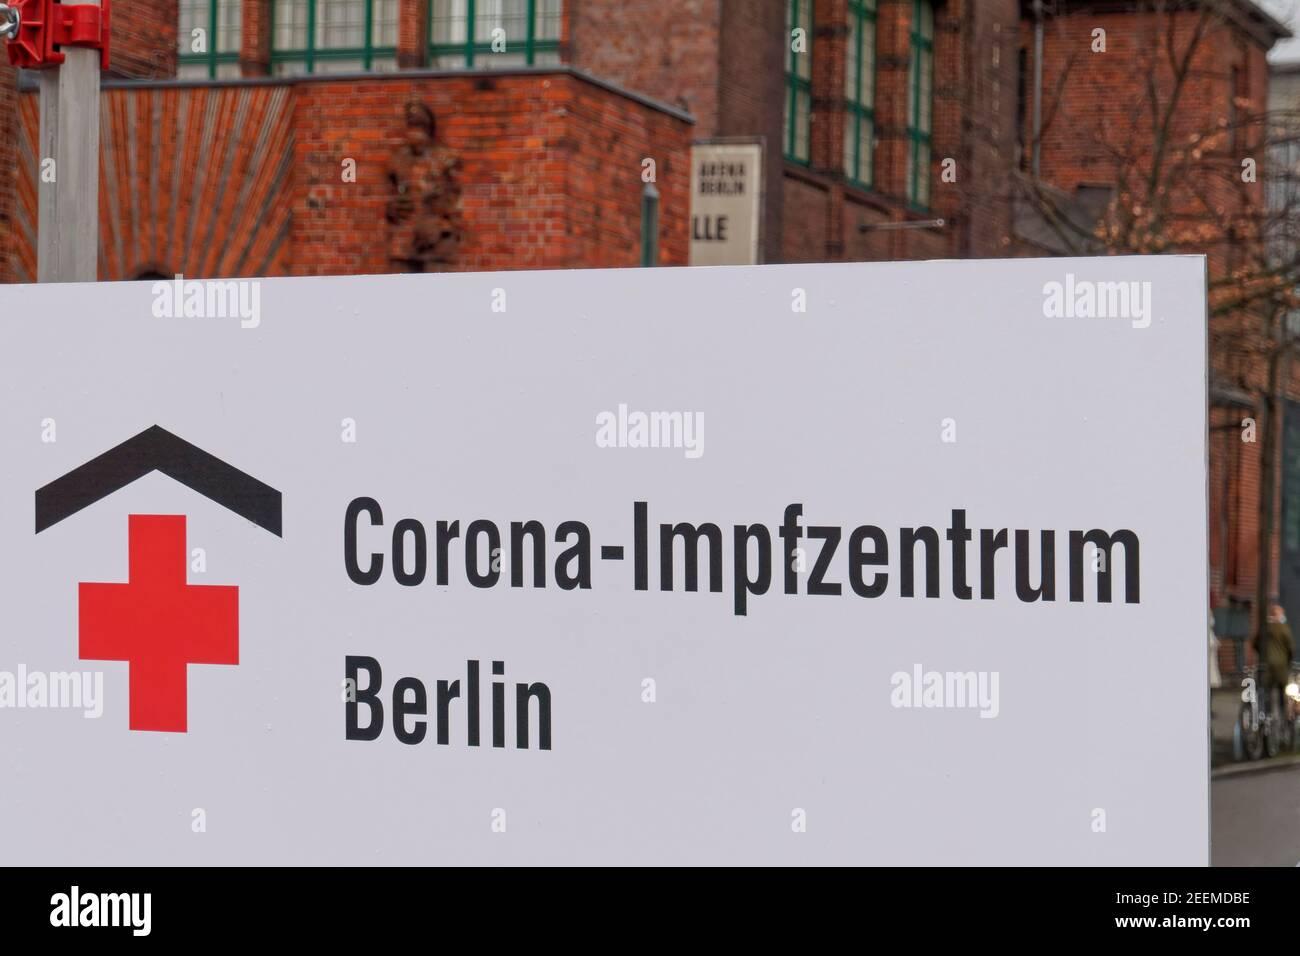 Corona Impfzentrum Arena Treptow, Berlin .  Corona-Impfzentrum / Corona, Covid-19, Covid19, Coronakrise, Coronavirus, Corona-Virus, Corona-Krise, Impf Stock Photo